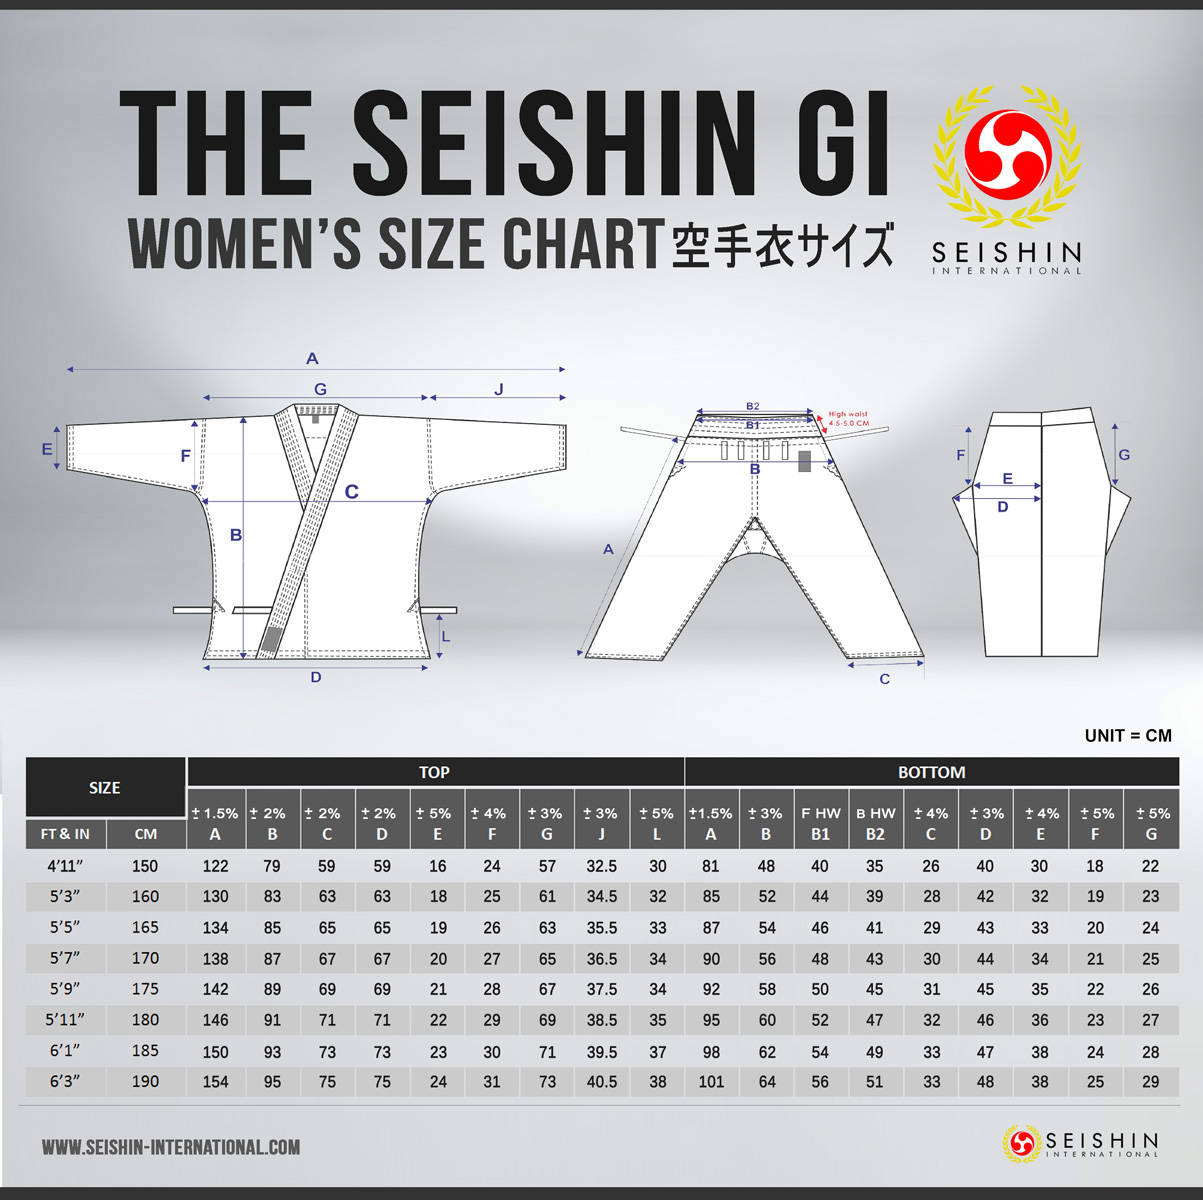 SEISHIN_GI_SIZE_CHART_WOMEN.jpg